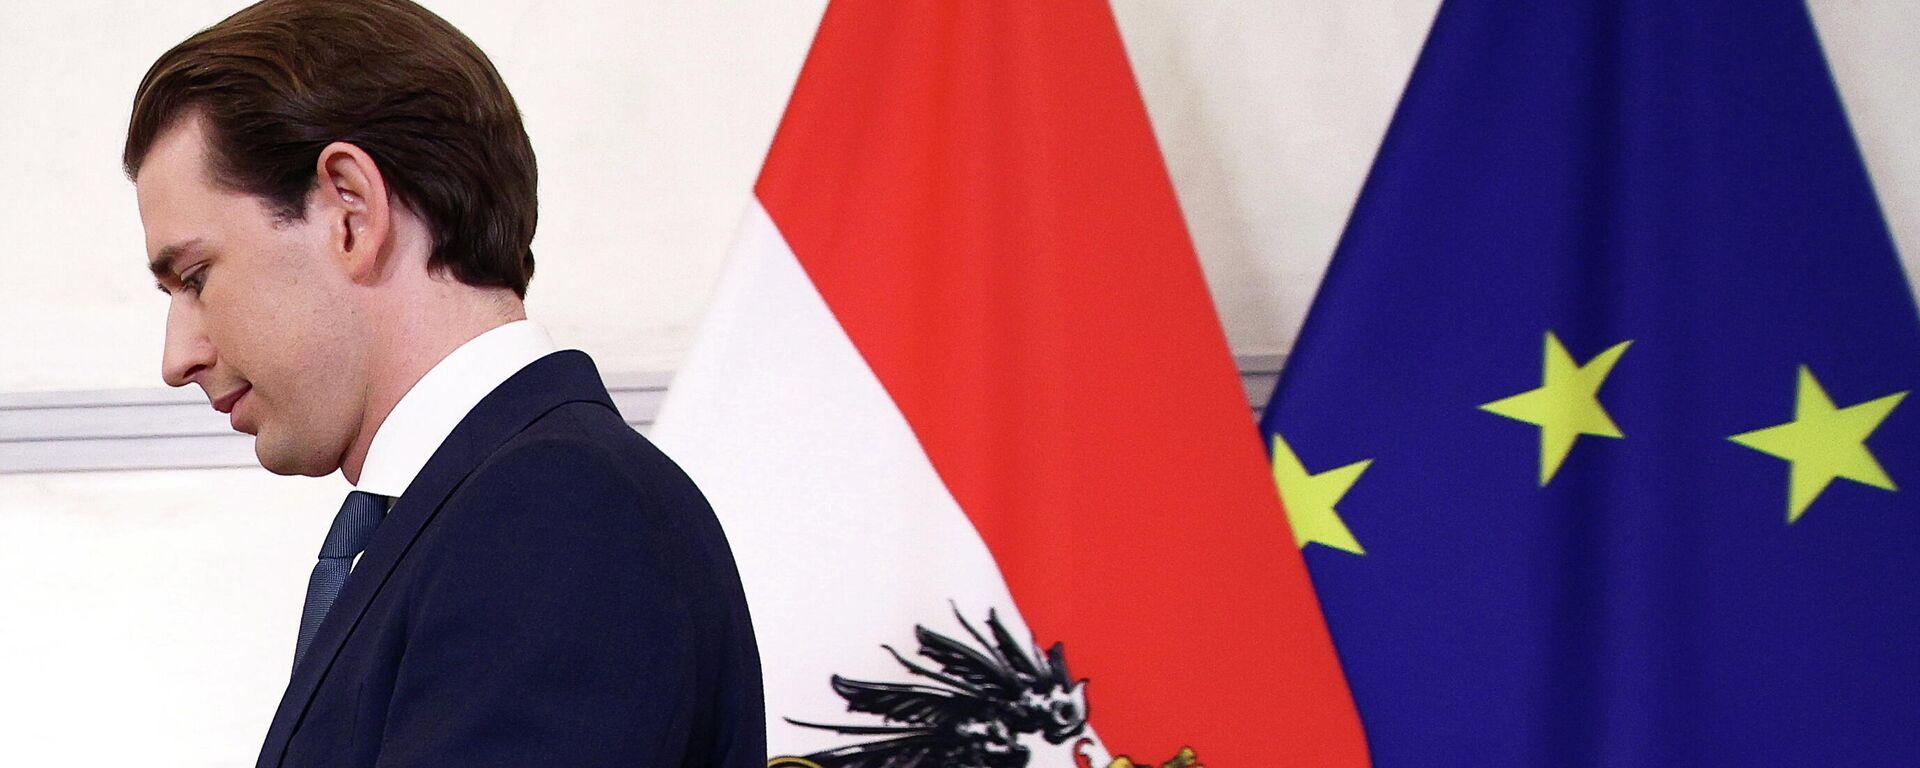 Österreichs Bundeskanzler Sebastian Kurz in Wien, 9.10.2021 - SNA, 1920, 09.10.2021